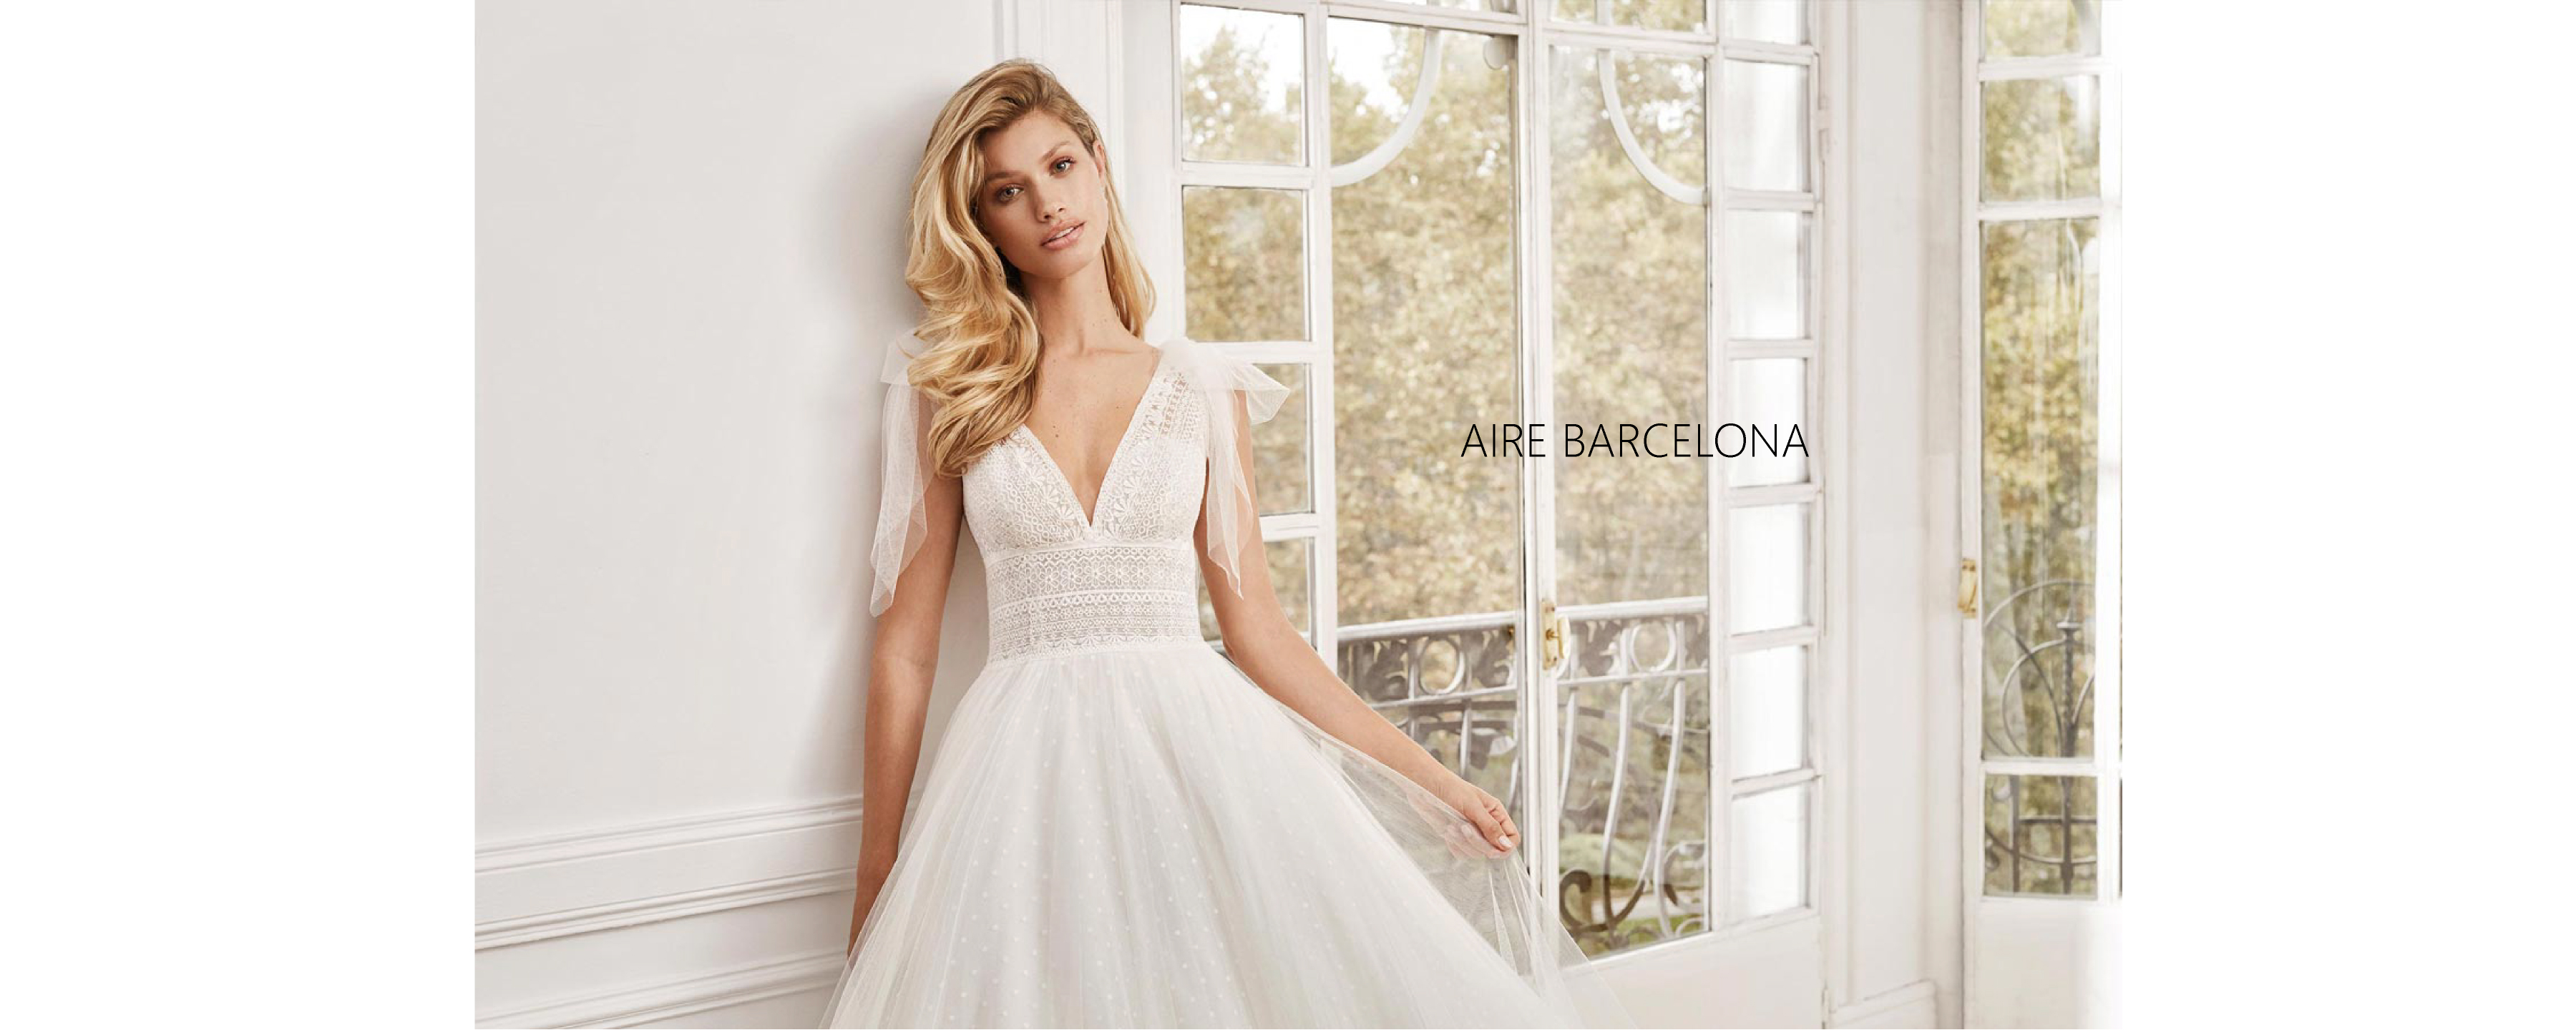 2bd15a13 Brudekjoler førende brudekjole designere - Copenhagen Bridal